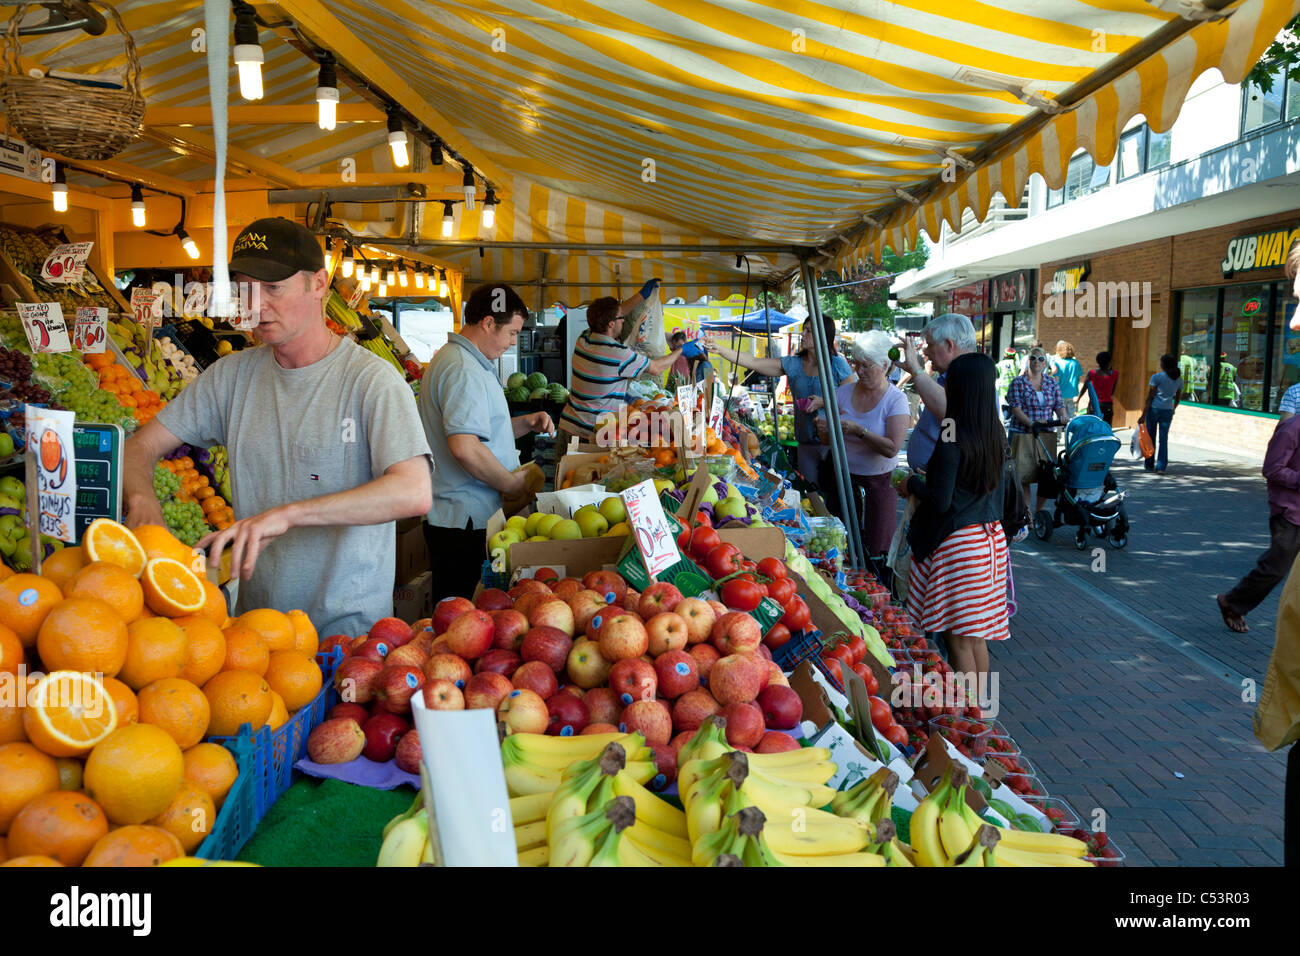 Street market stall fruit traders, - Stock Image